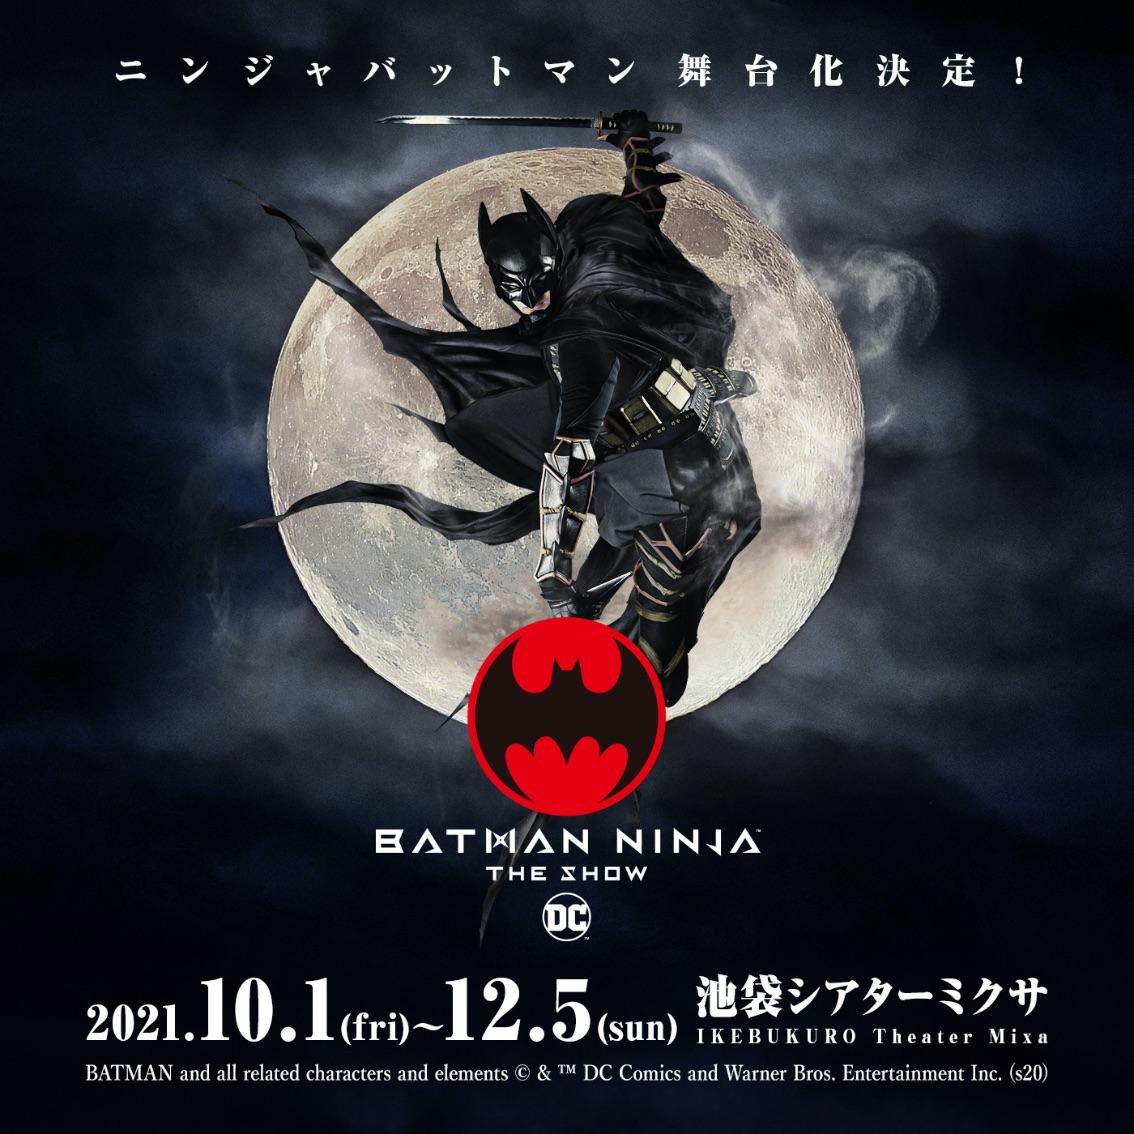 batman-ninja-the-show-%e3%83%8b%e3%83%b3%e3%82%b8%e3%83%a3%e3%83%90%e3%83%83%e3%83%88%e3%83%9e%e3%83%b3-%e3%82%b6%e3%83%bb%e3%82%b7%e3%83%a7%e3%83%bc%e5%bf%8d%e8%80%85-2-2